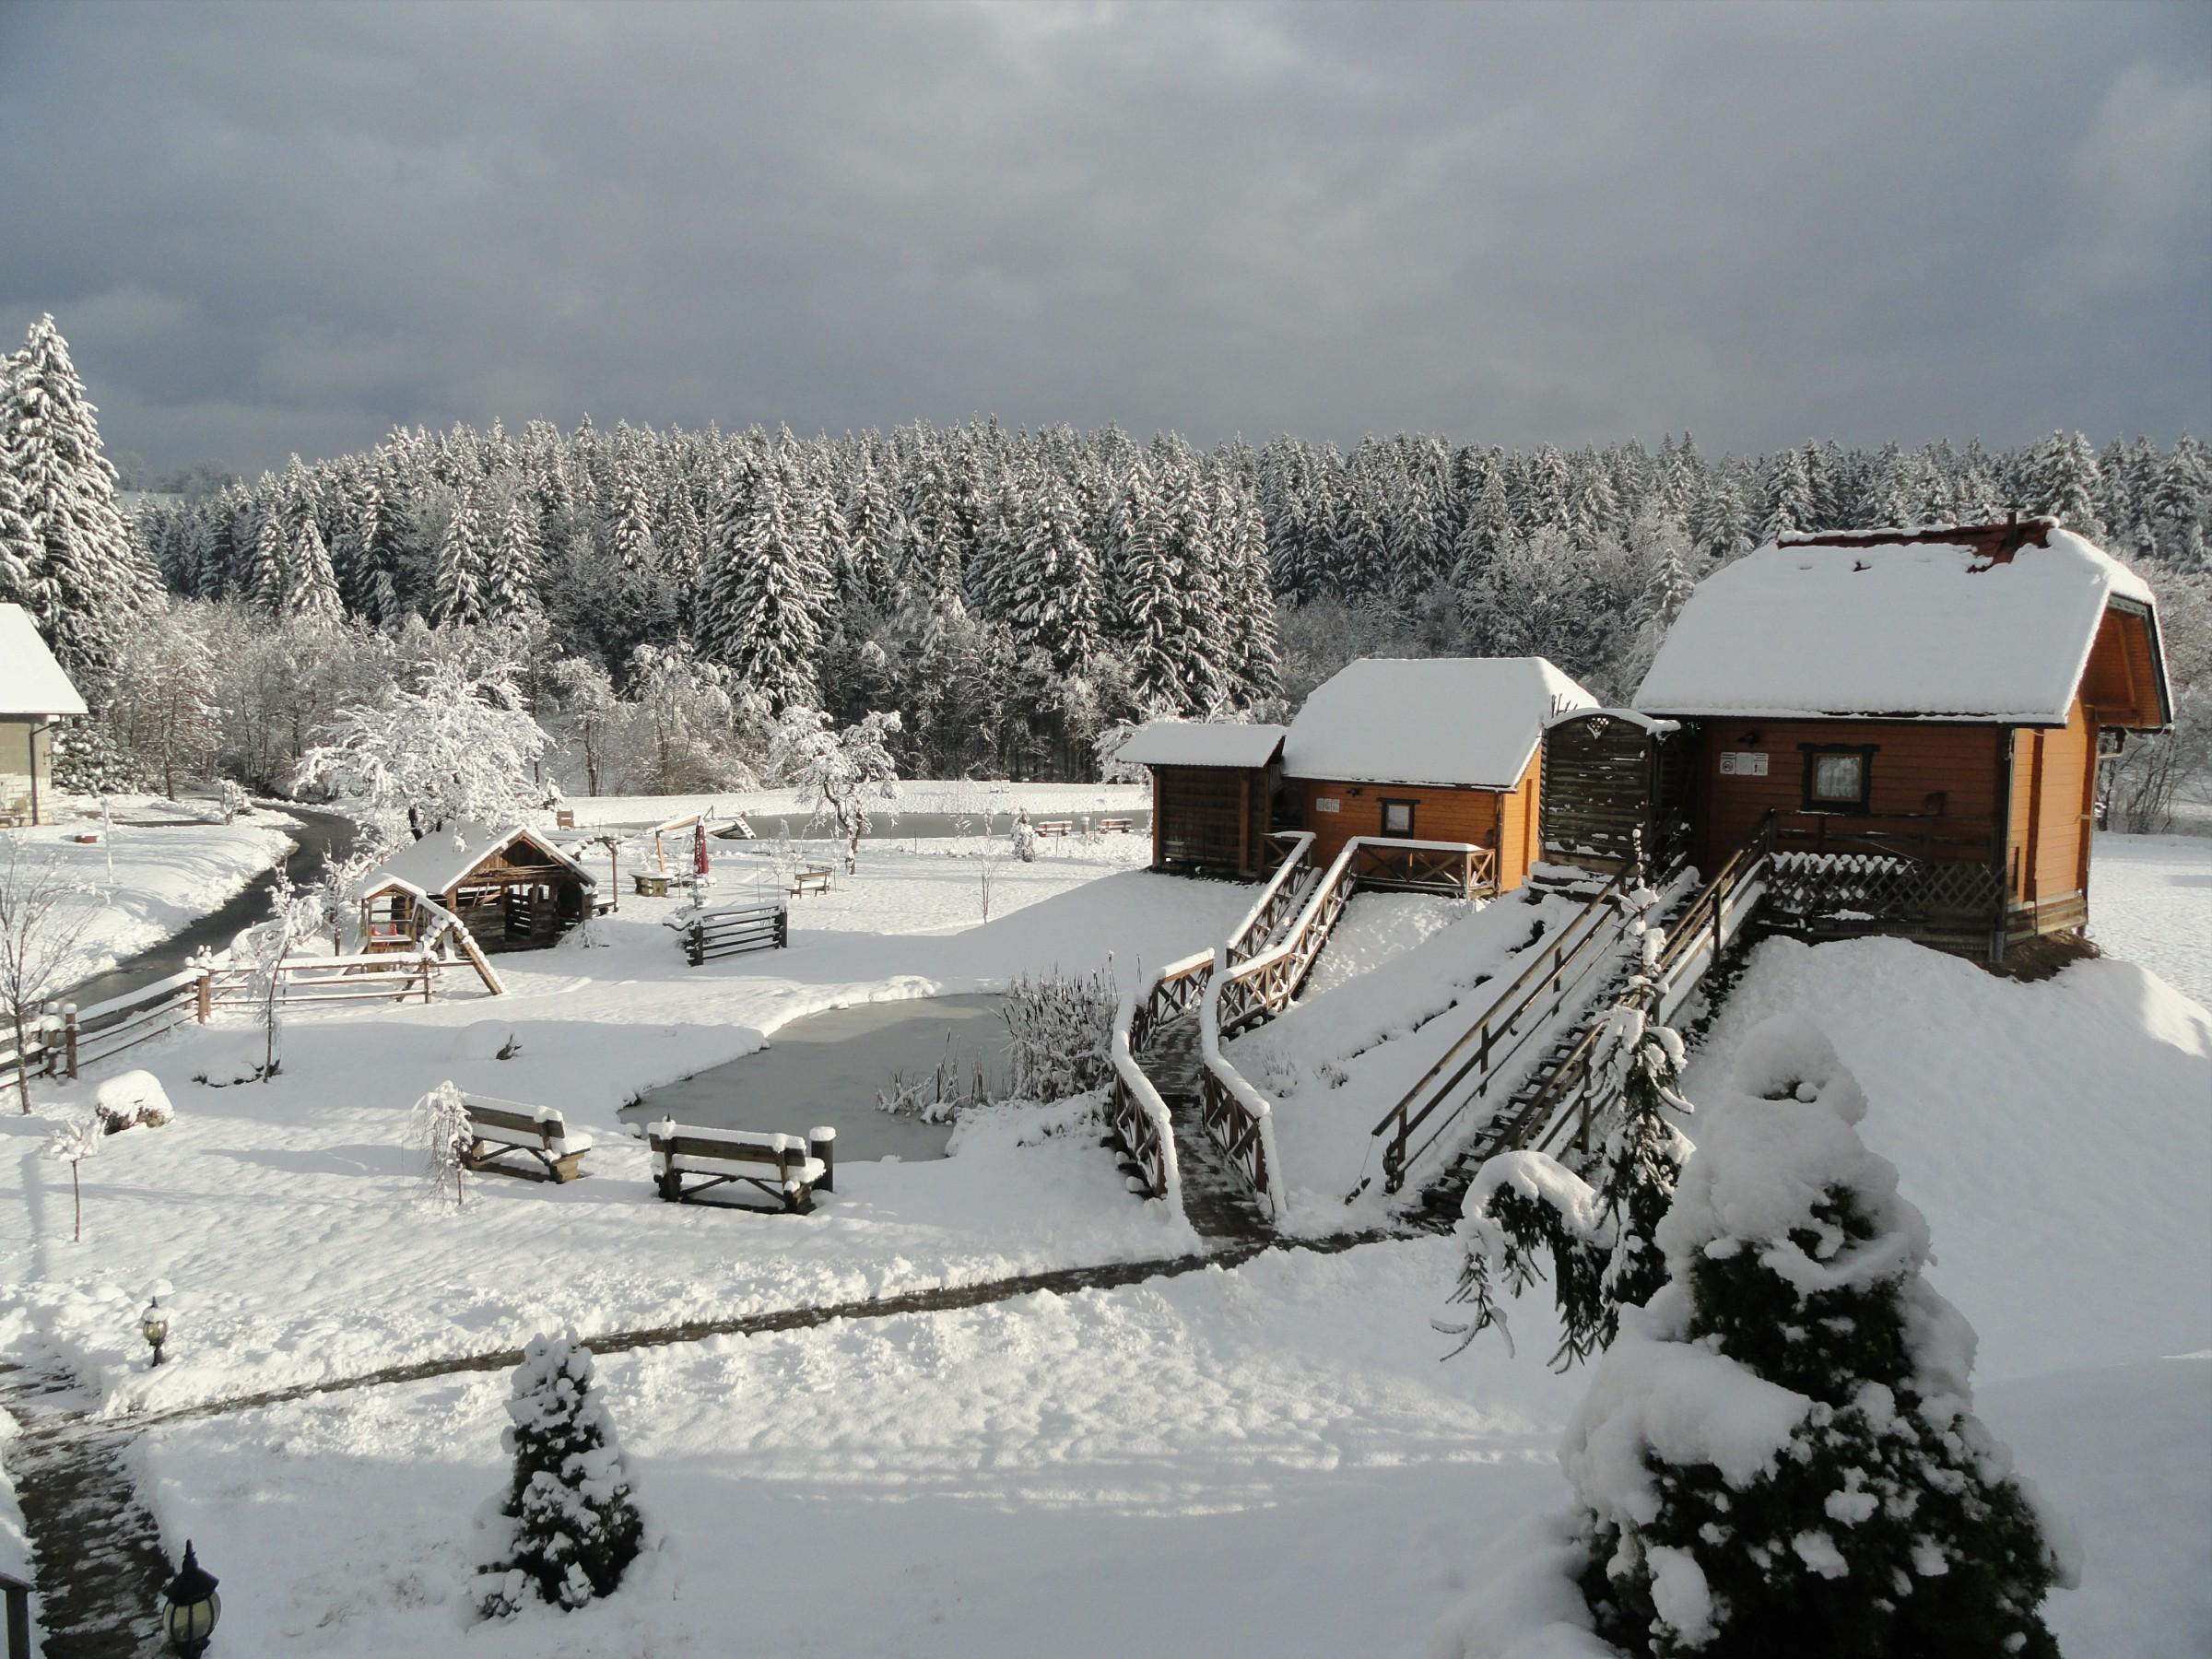 A. Koroτec-okolica, foto arhiv Koroτec, Savinjske Alpe